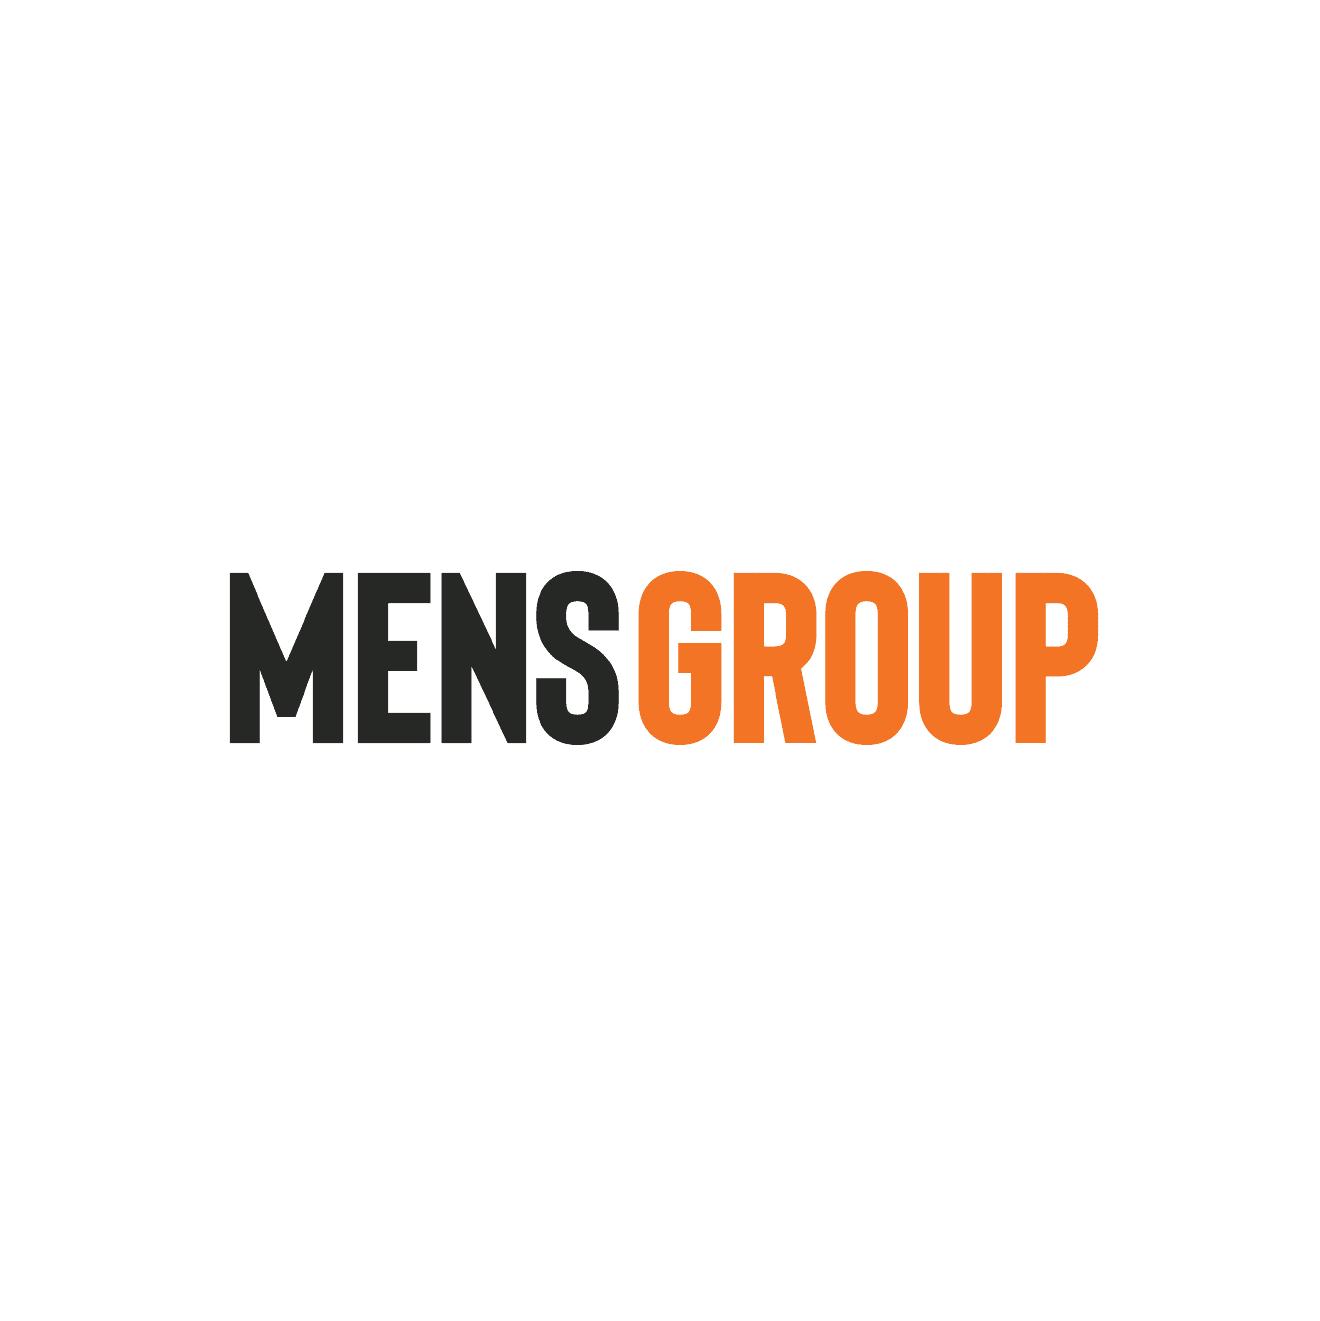 MensGroup logo design